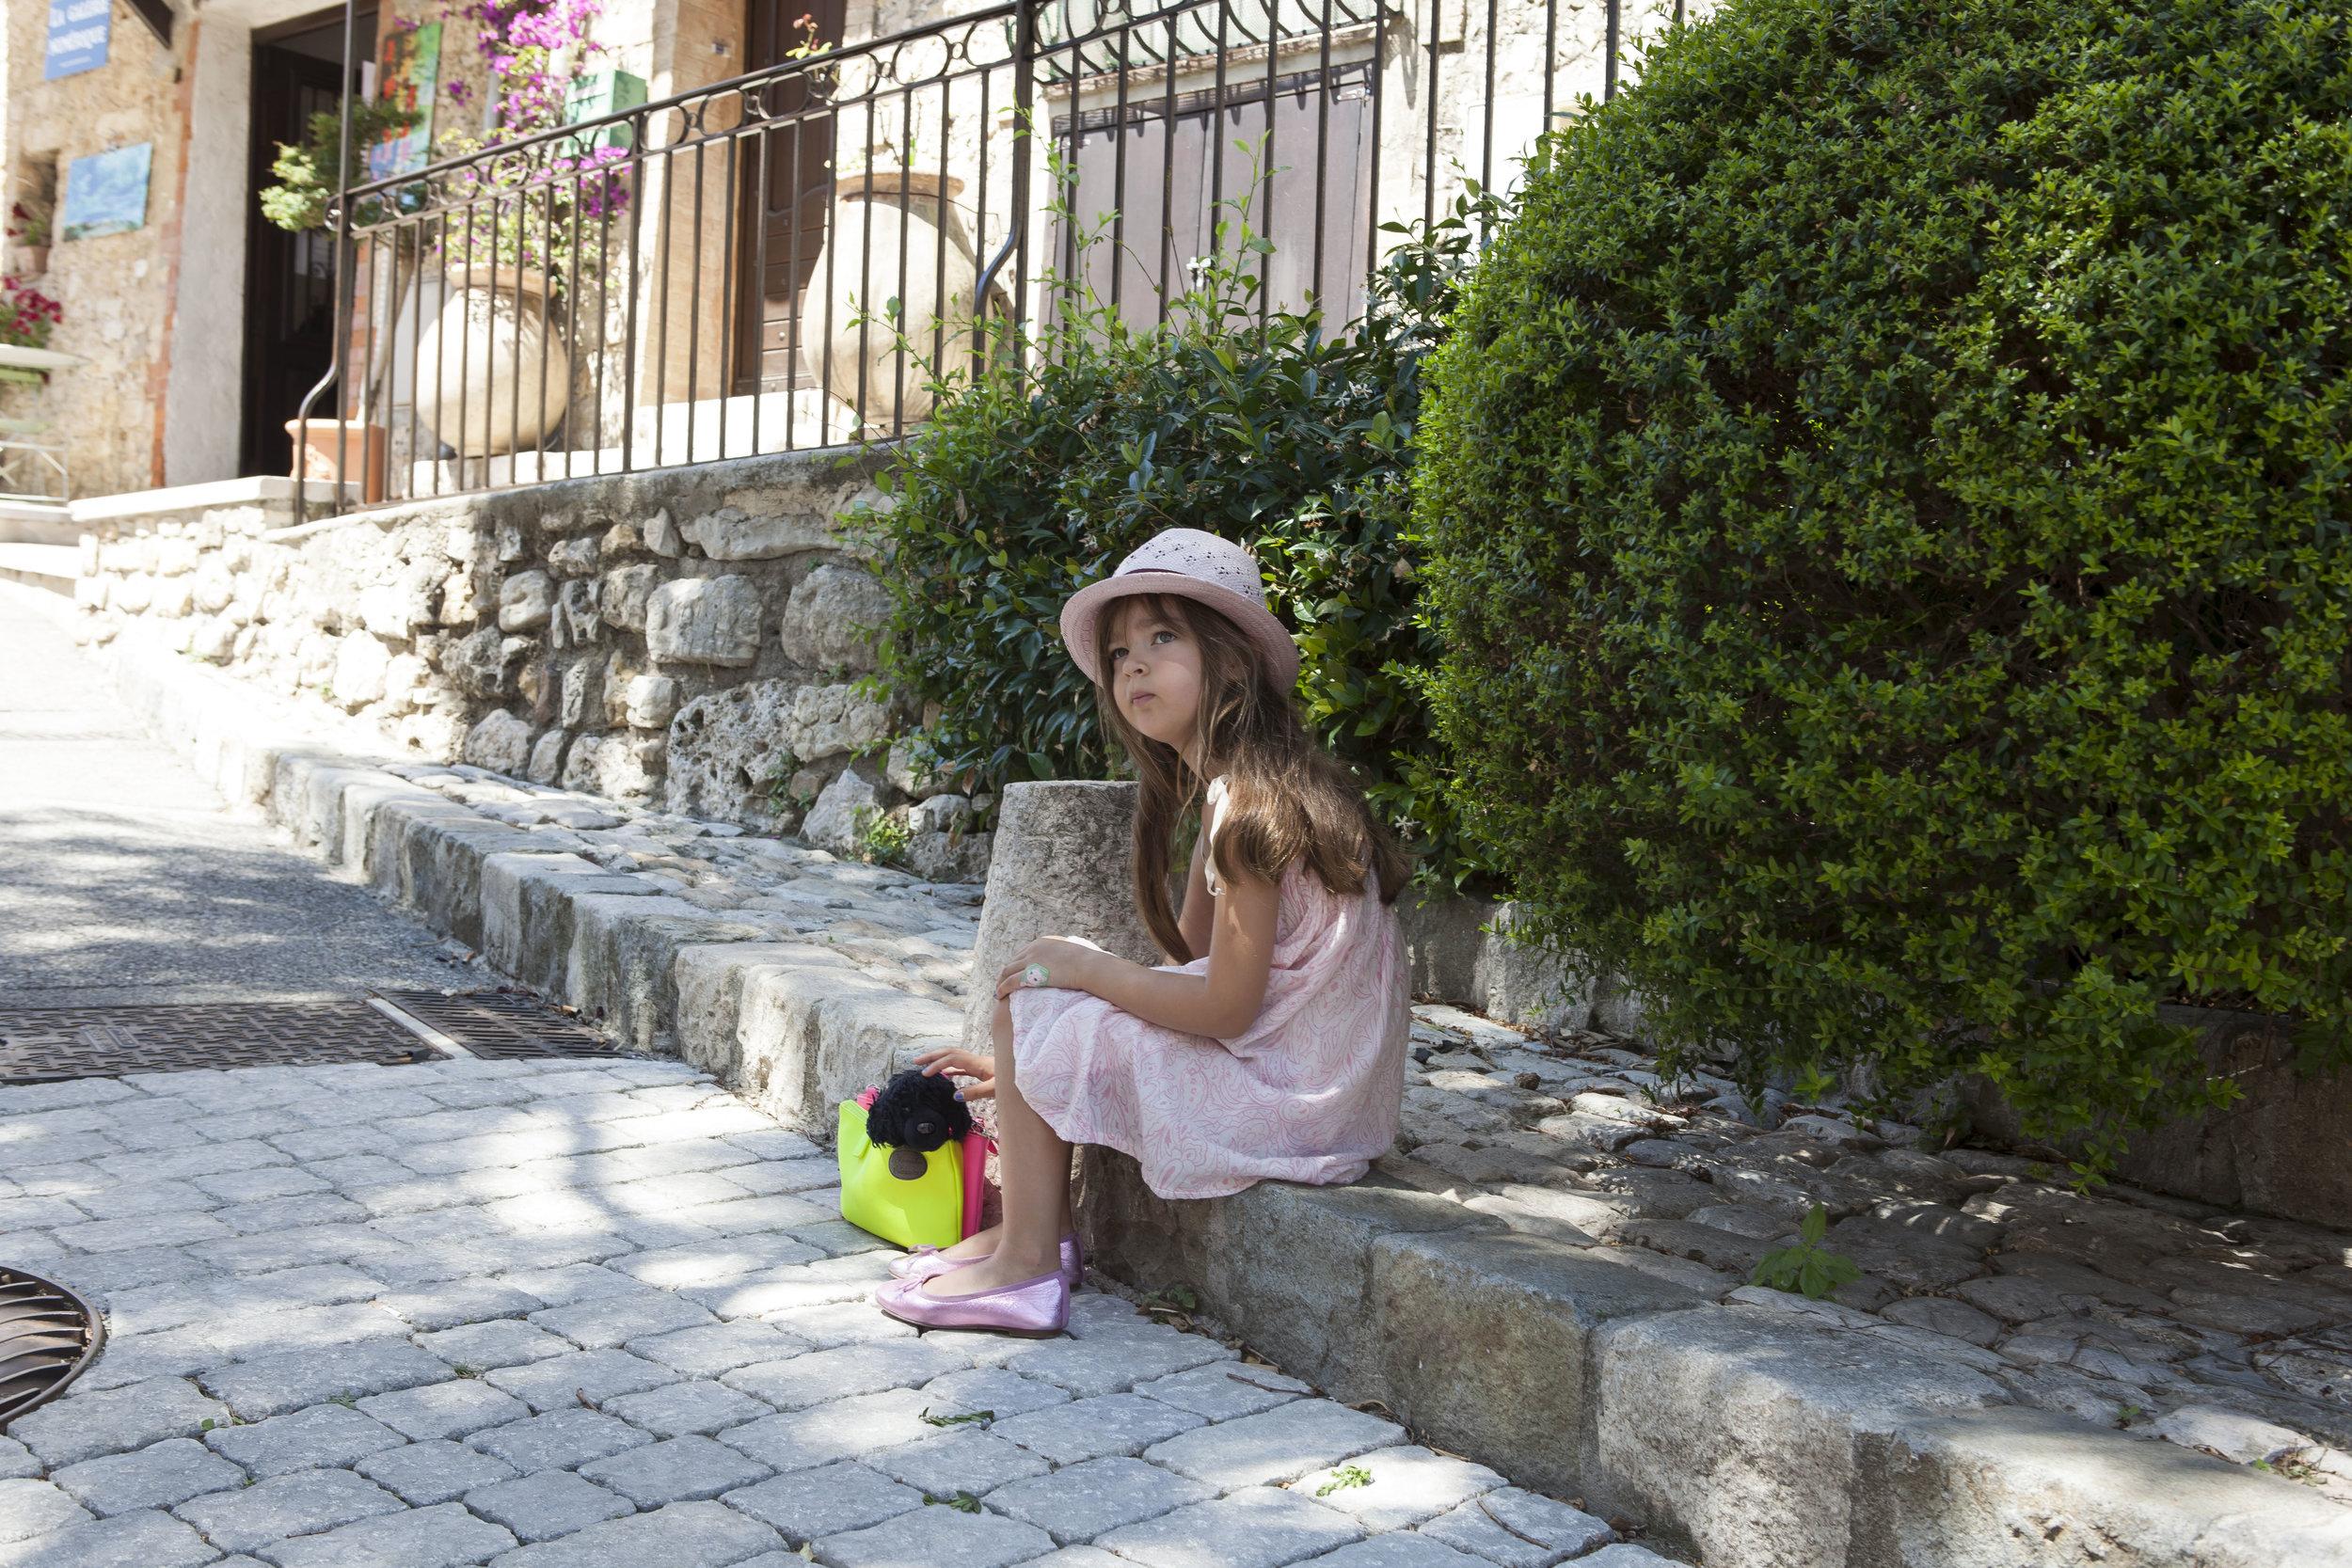 Rose Family Trip to France- Summer '15_20150628_00020.JPG